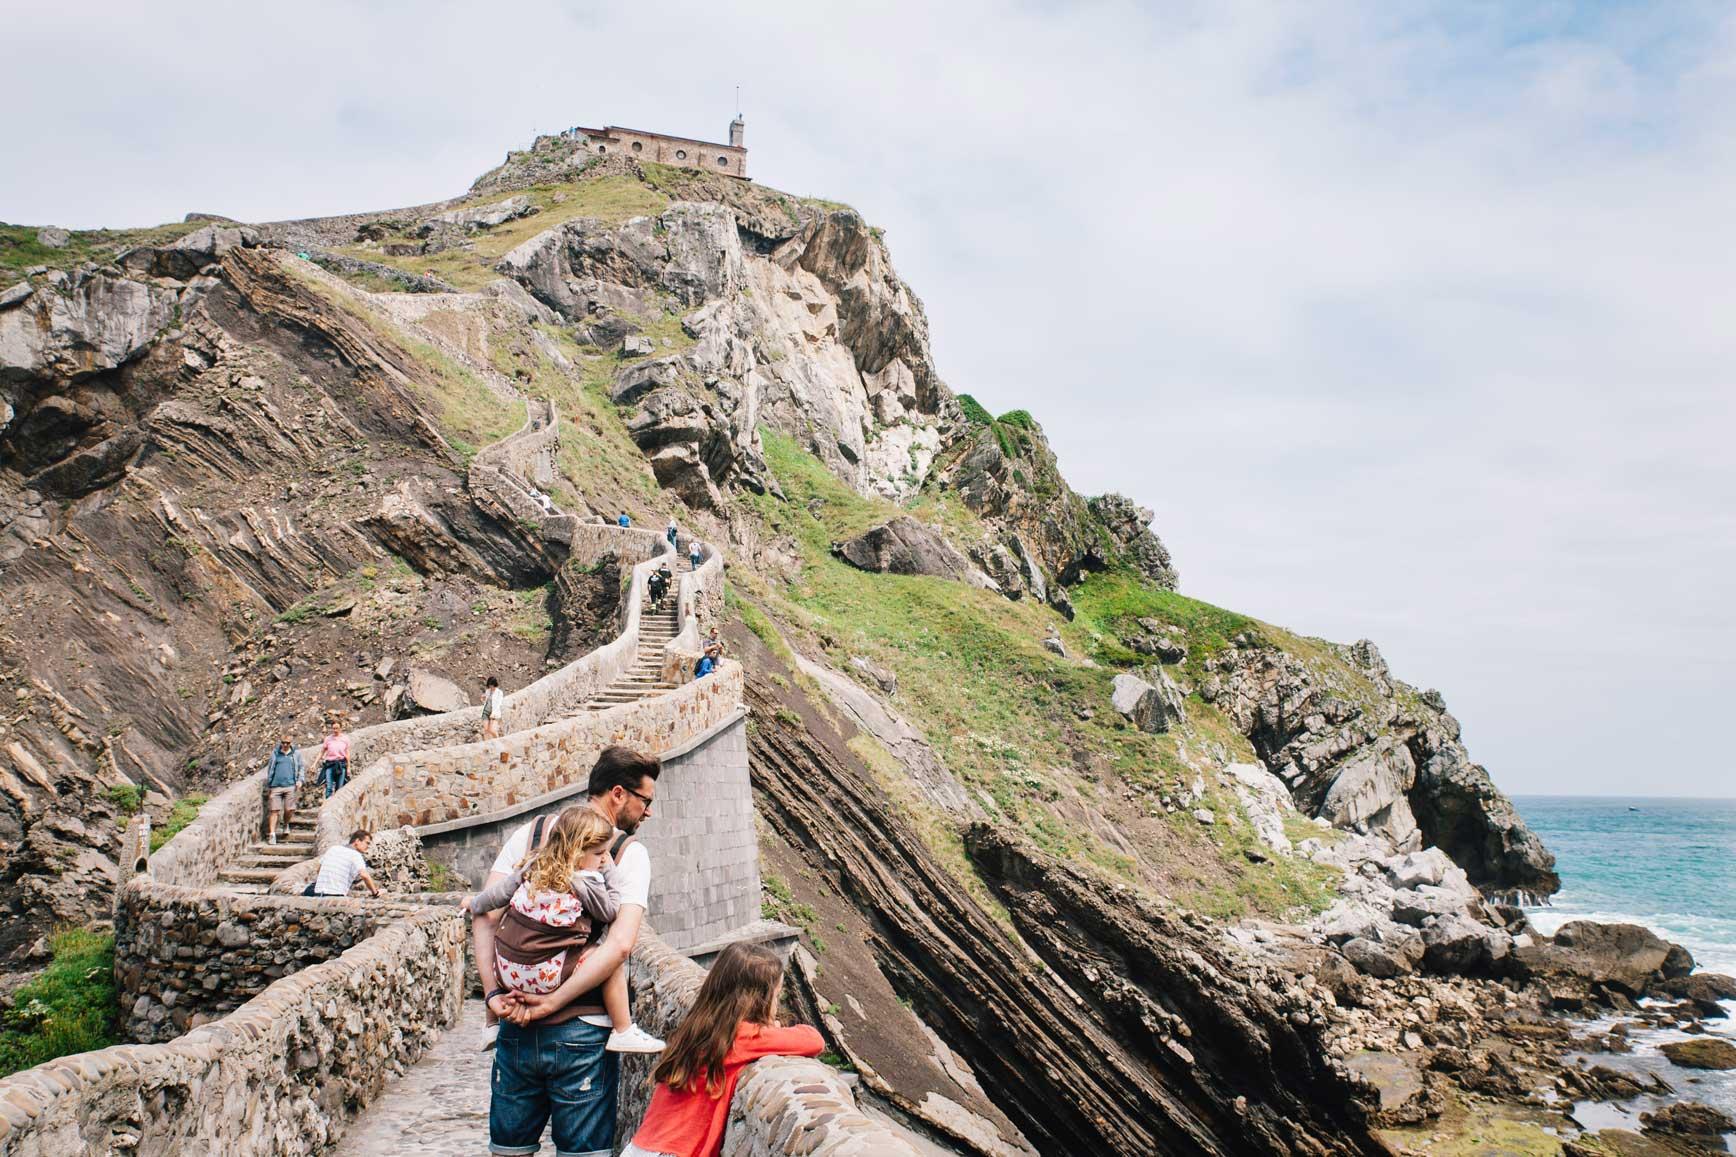 San-Juan-de-Gaztelugatxe_claraBmartin.com